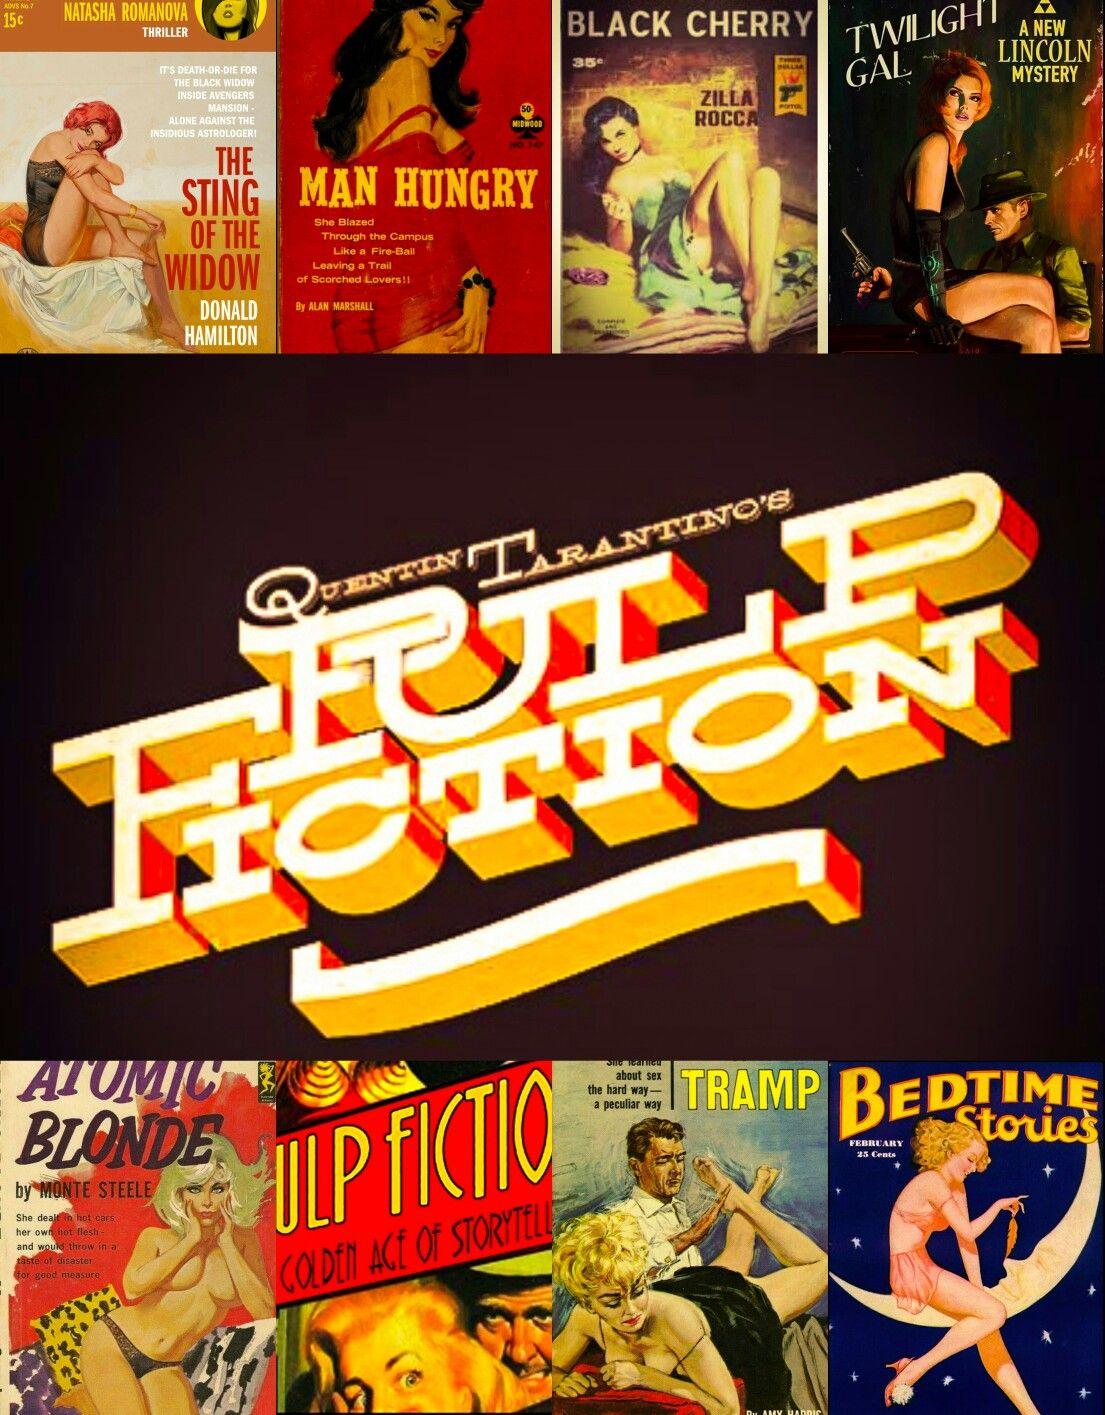 Pulp Fiction poster noir Wallpaper Tarantino Pulp